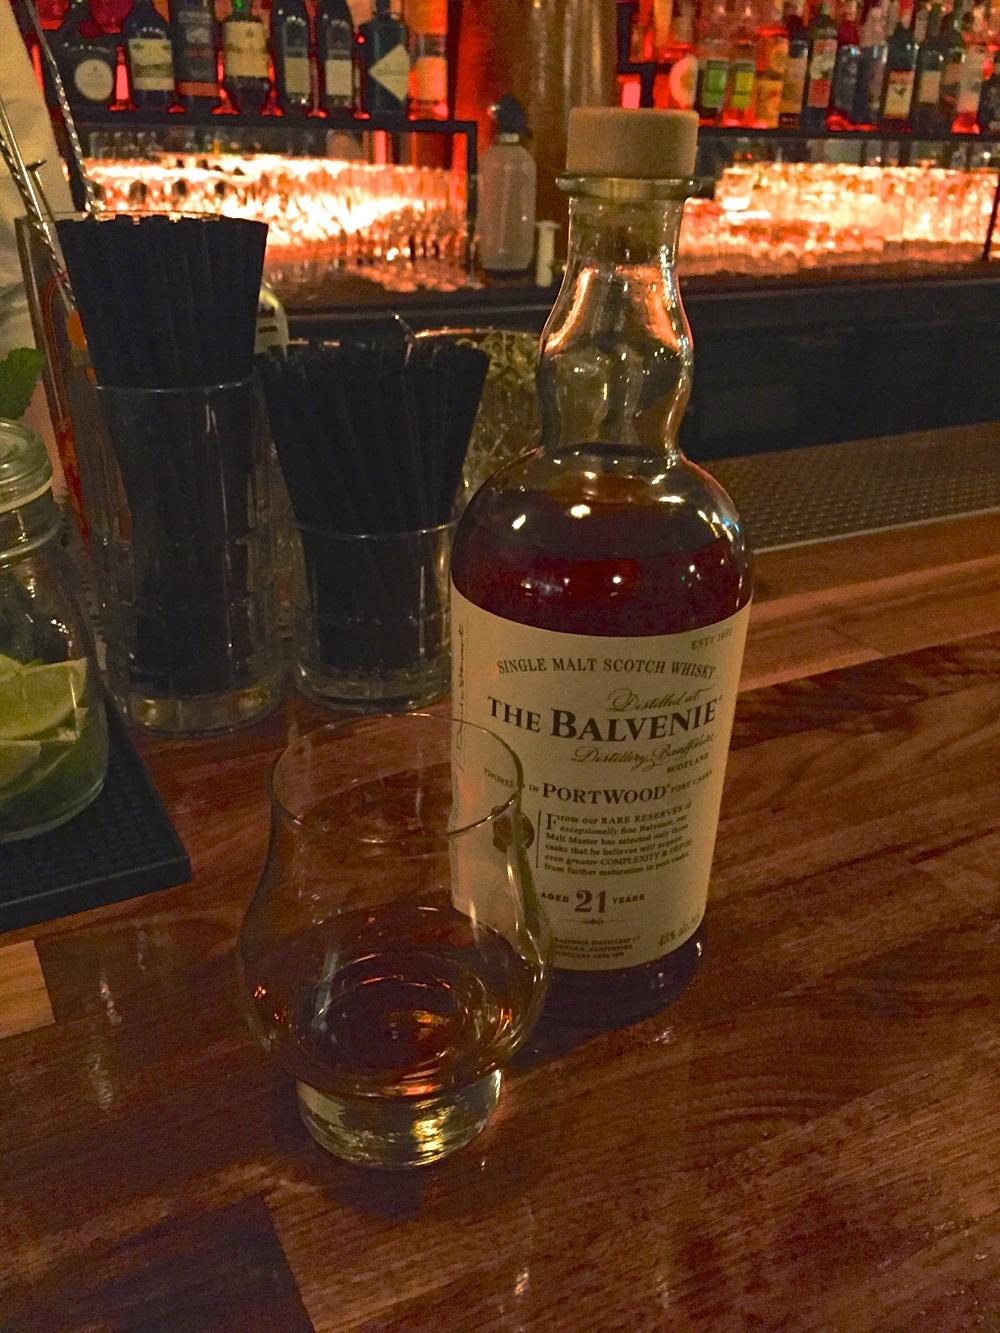 A fine rare Scotch at Bottle & Bull